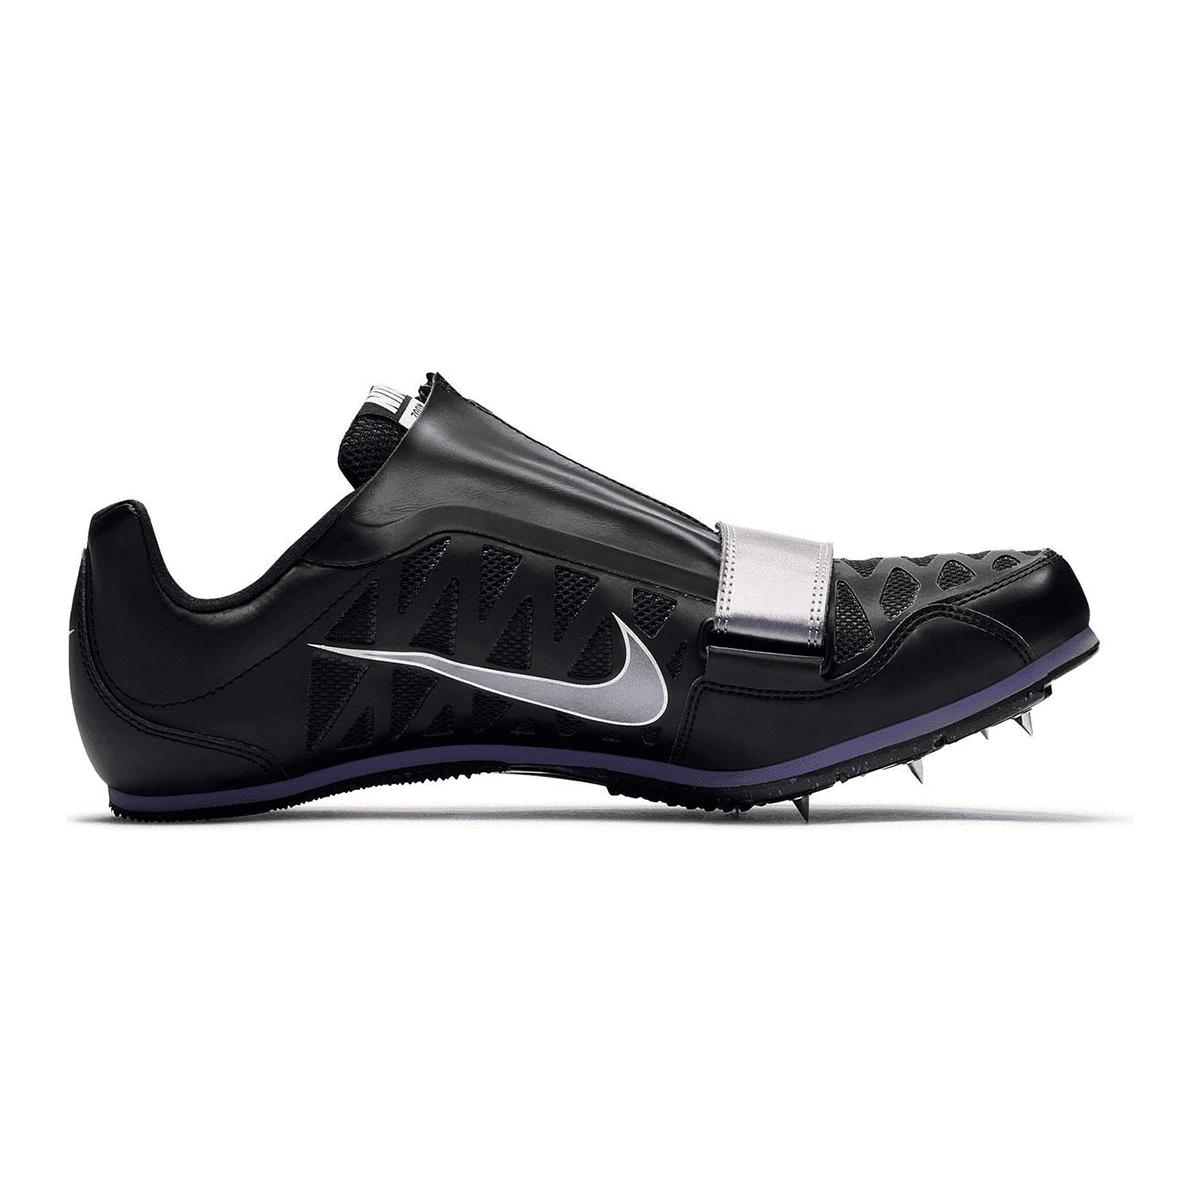 Nike Zoom Long Jump 4 Track Spikes - Color: Black/Indigo Fog/White/Steller Indigo - Size: 4 - Width: Regular, Black/Indigo Fog/White/Steller Indigo, large, image 1